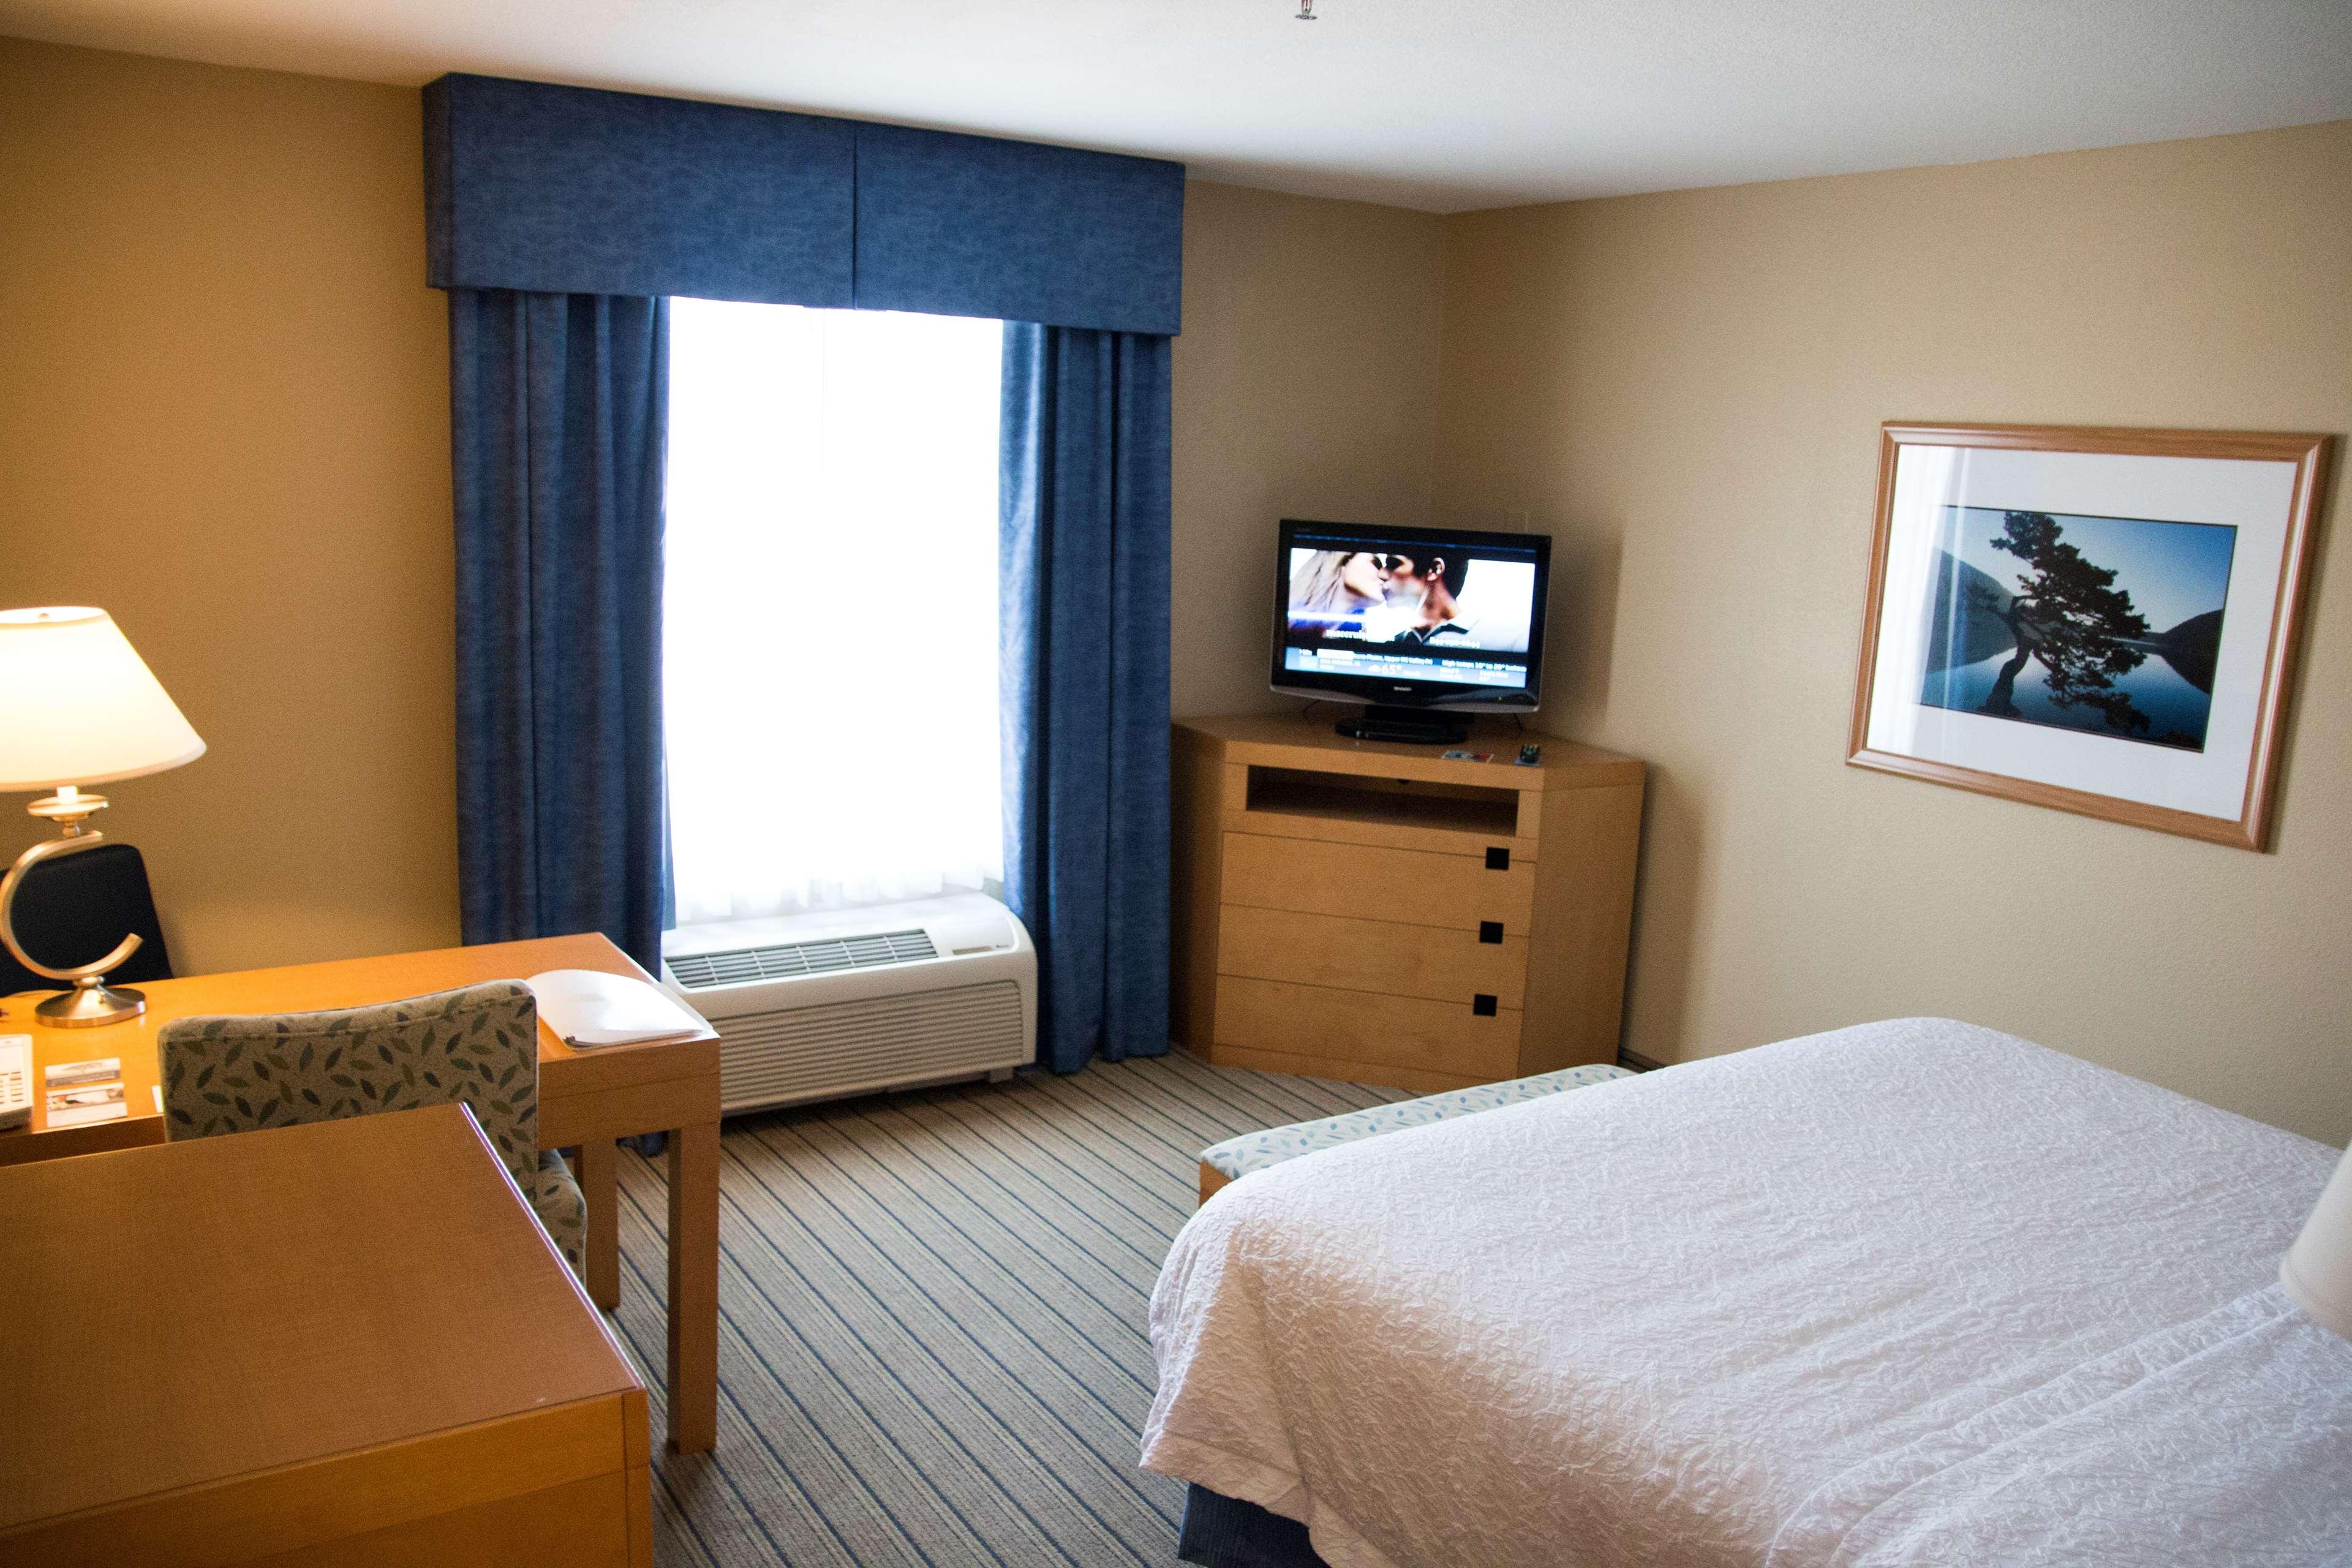 Hampton Inn & Suites Madera image 18